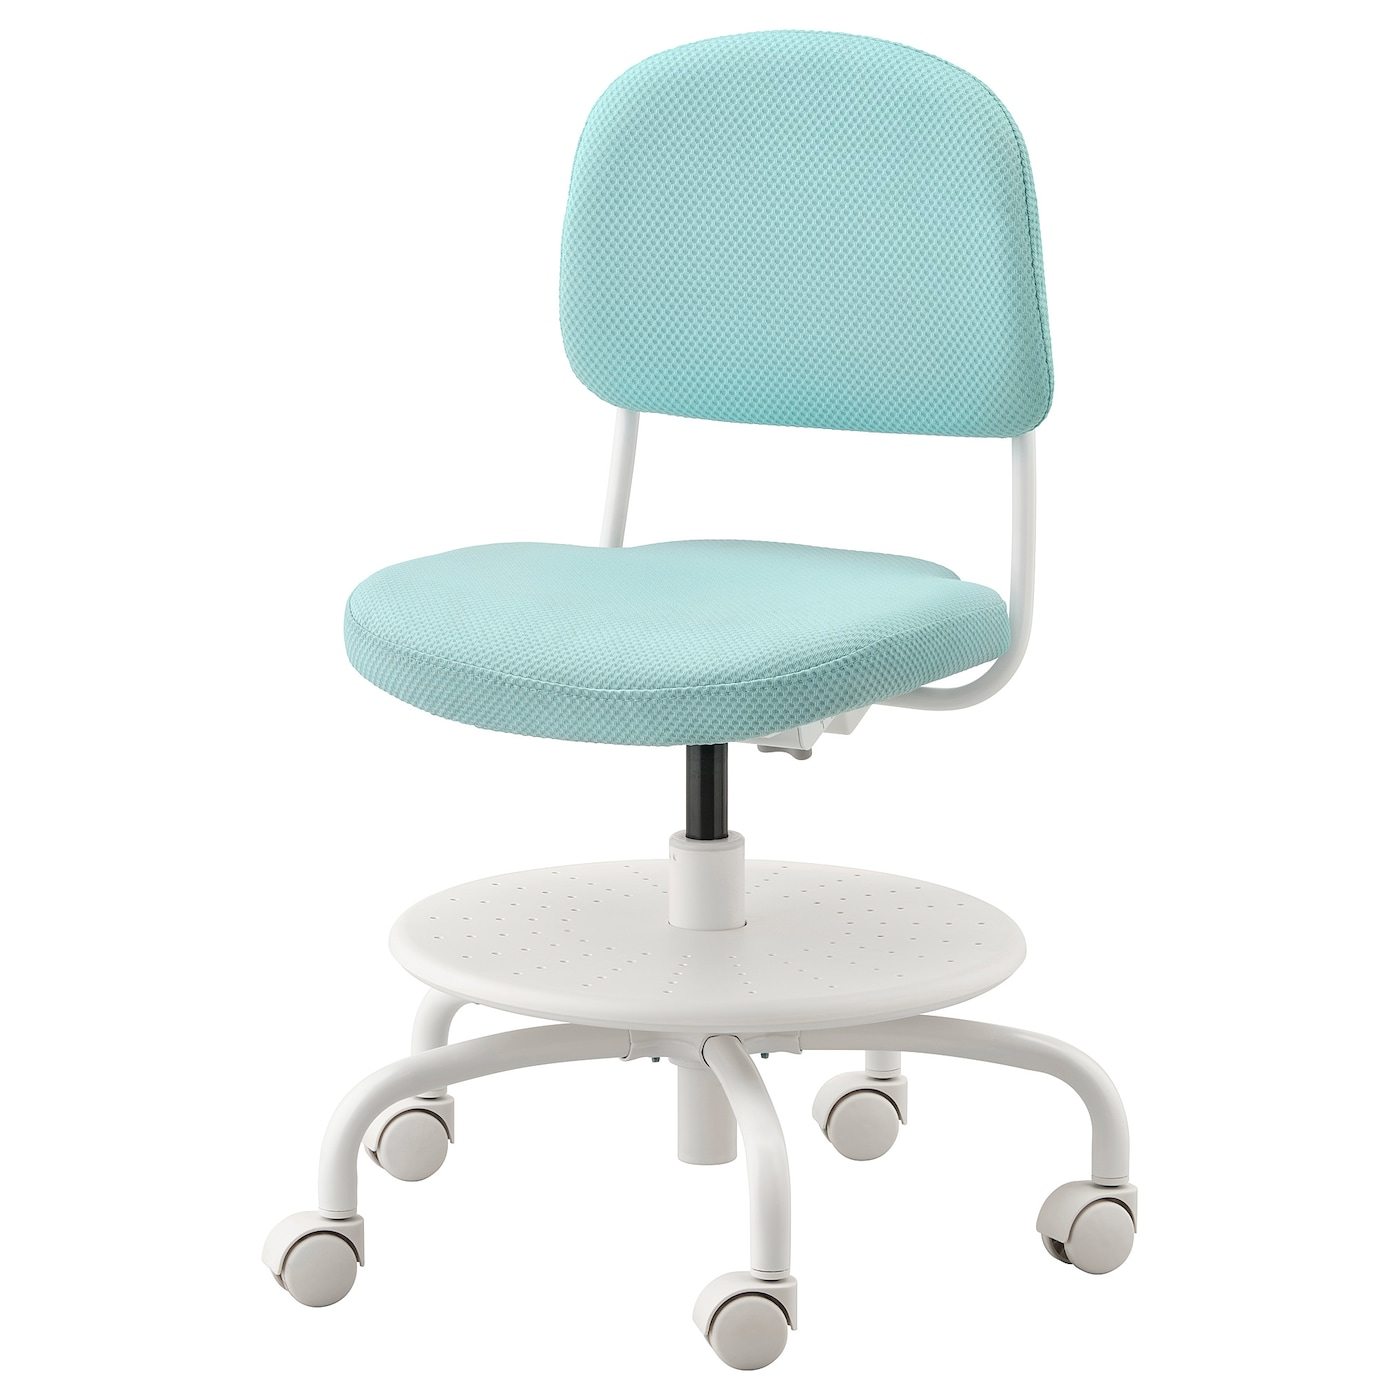 Enjoyable Vimund Childs Desk Chair Light Pink Home Interior And Landscaping Ologienasavecom